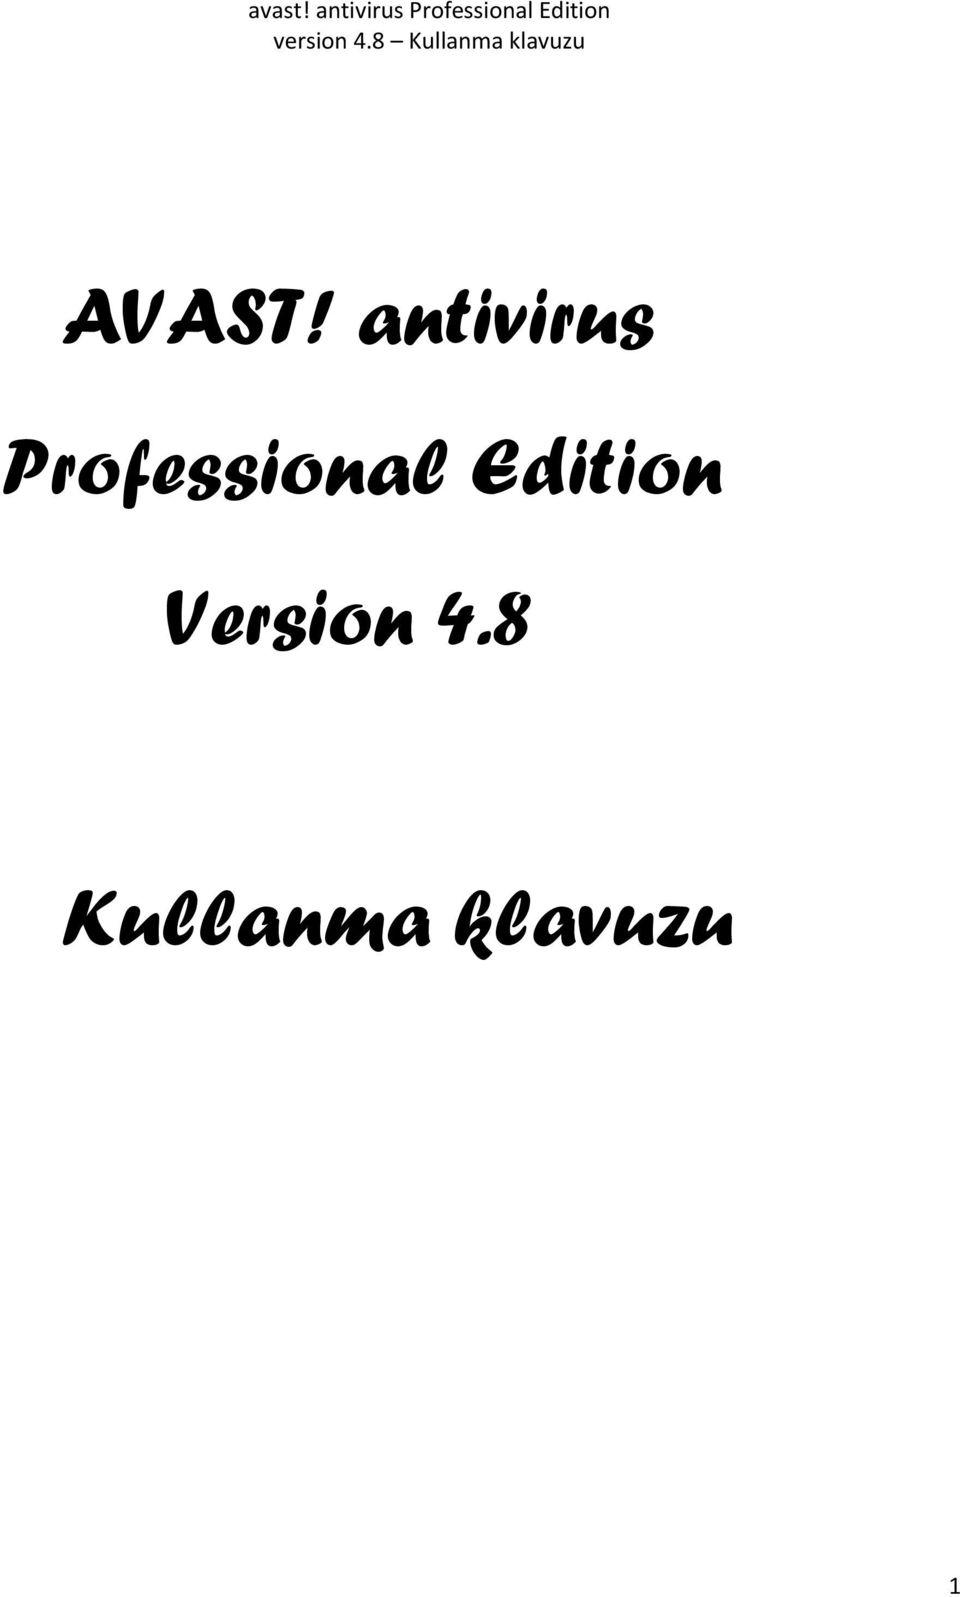 avast! antivirus Professional Edition version 4.8 Kullanma